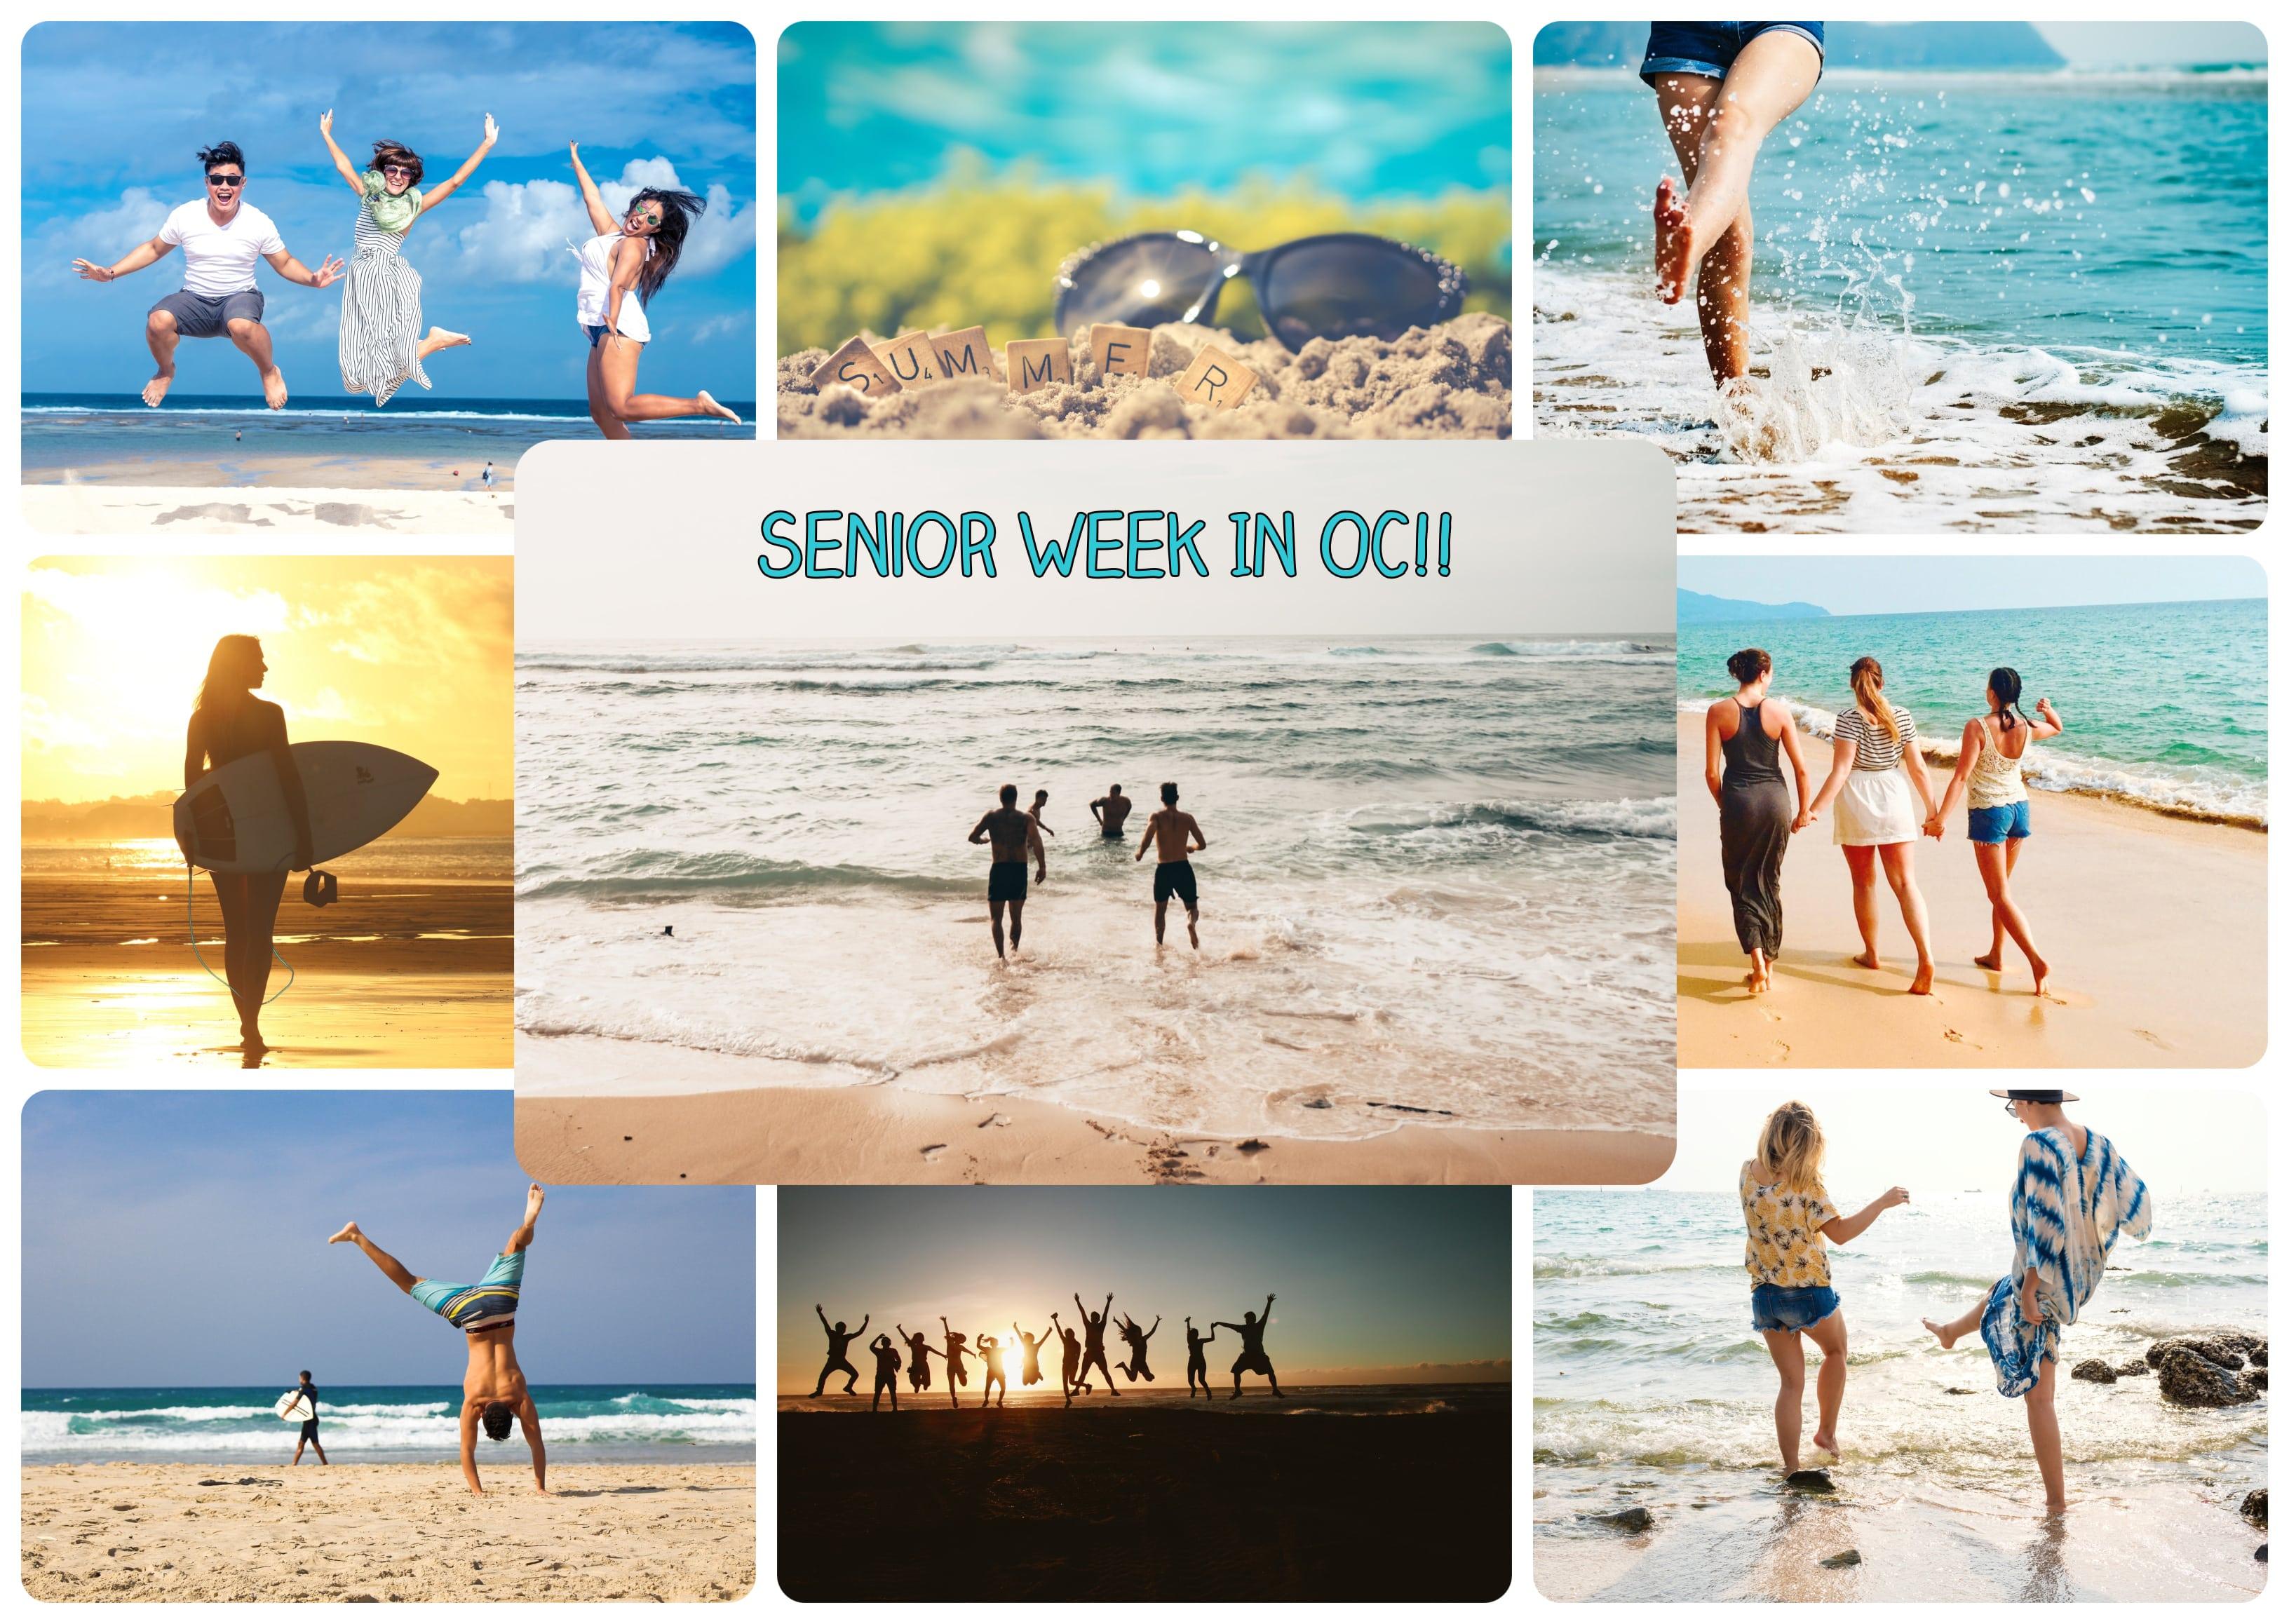 Ocean City Md Events 2020.Senior Week 2020 Ocean City Md Senior Week In Ocean City